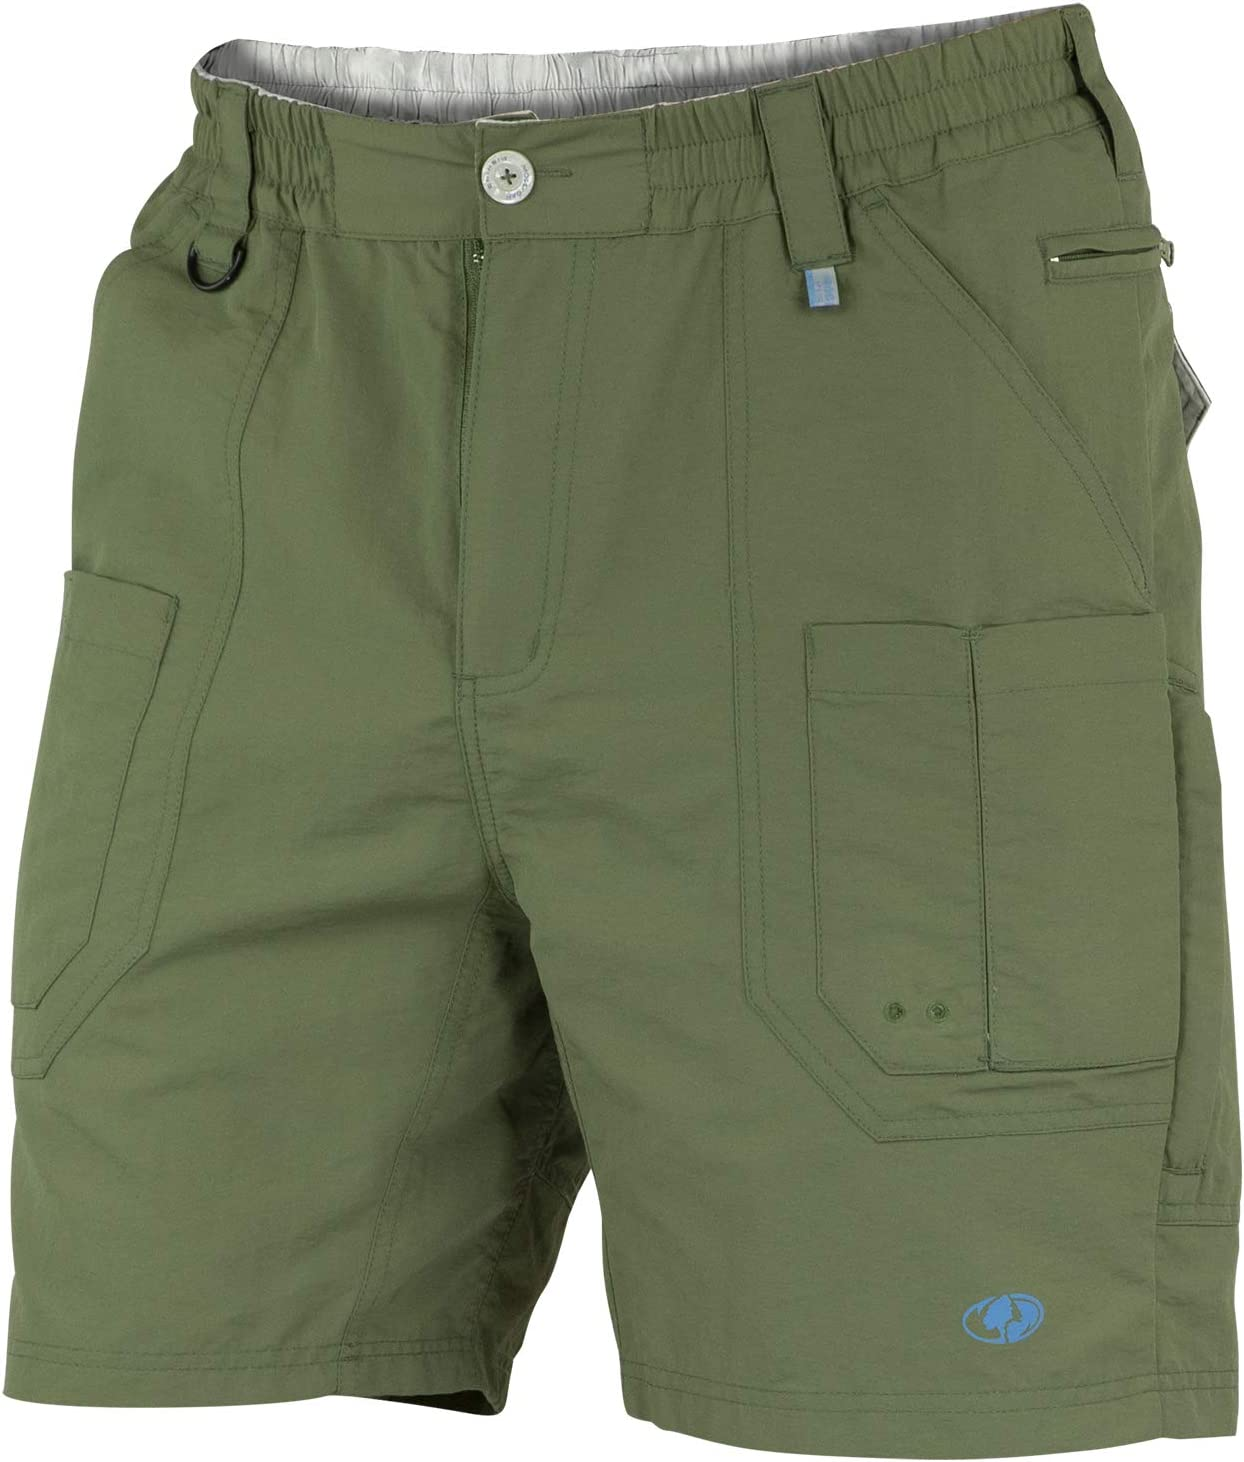 Mossy Oak XTR Mens Fishing Shorts Quick Dry /& Wicking Shorts